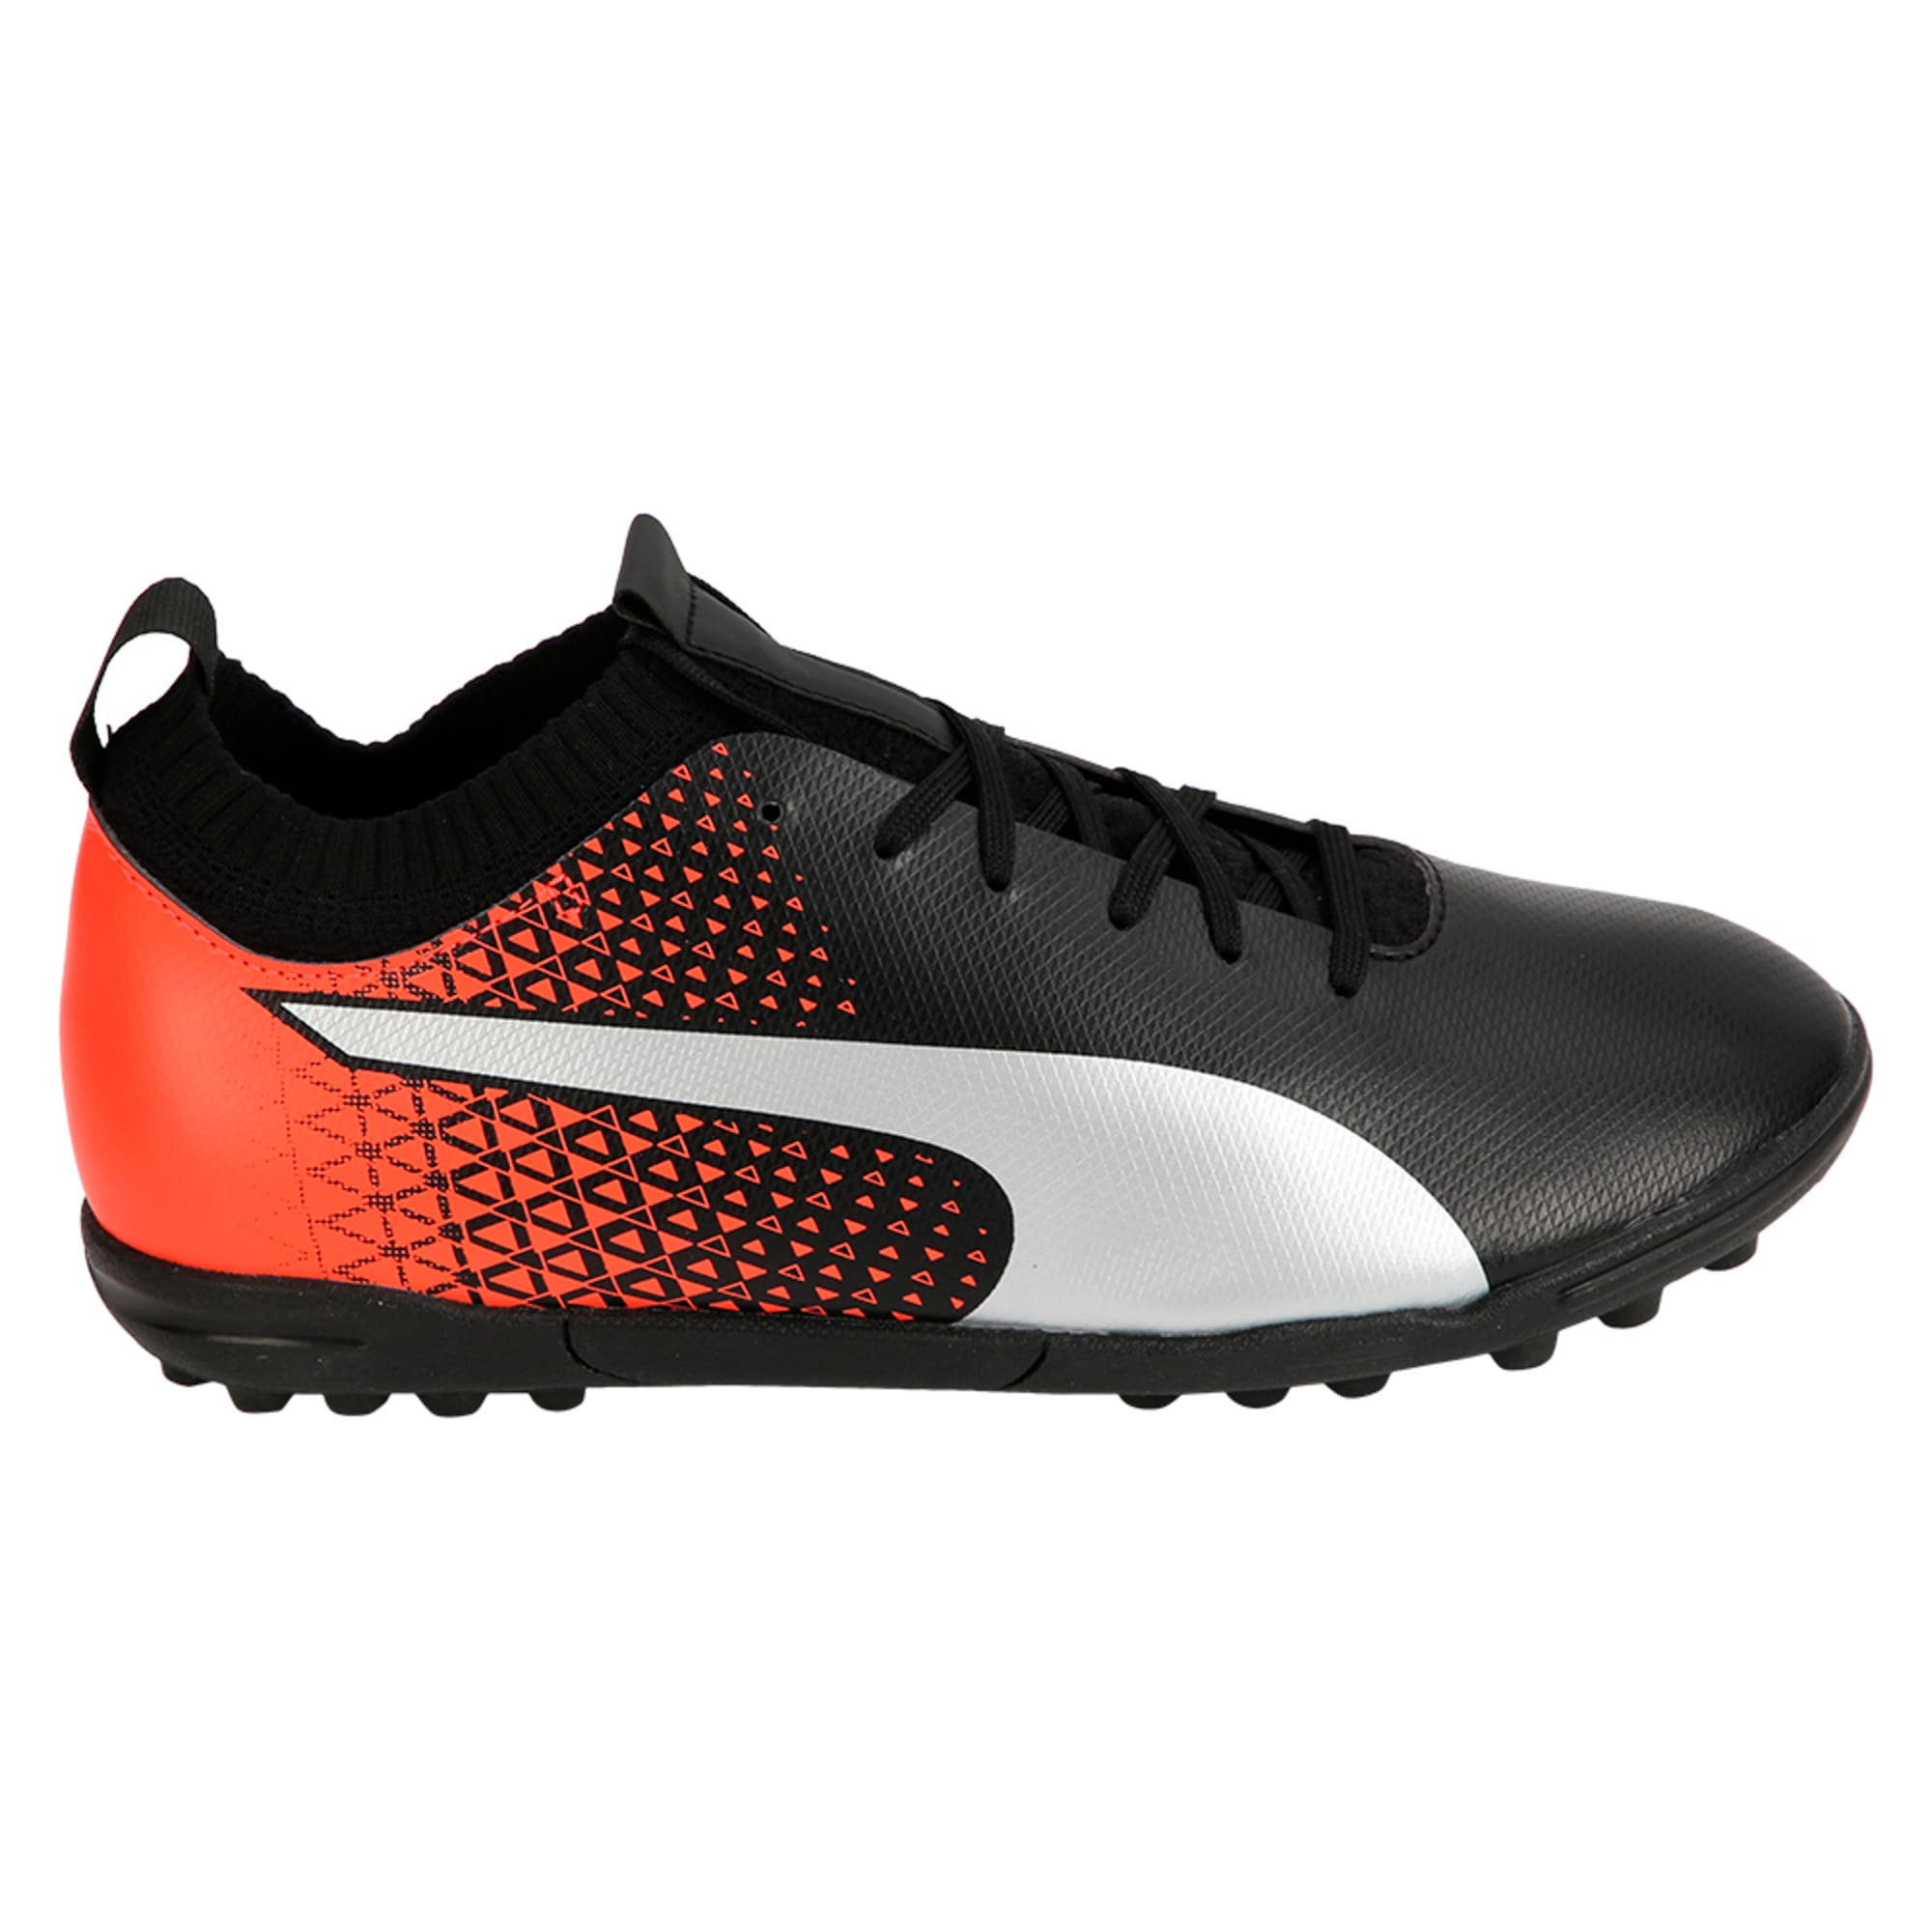 Thumbnail 5 of evoKNIT TT Men's Football Shoes, Black-Silver-Red, medium-IND